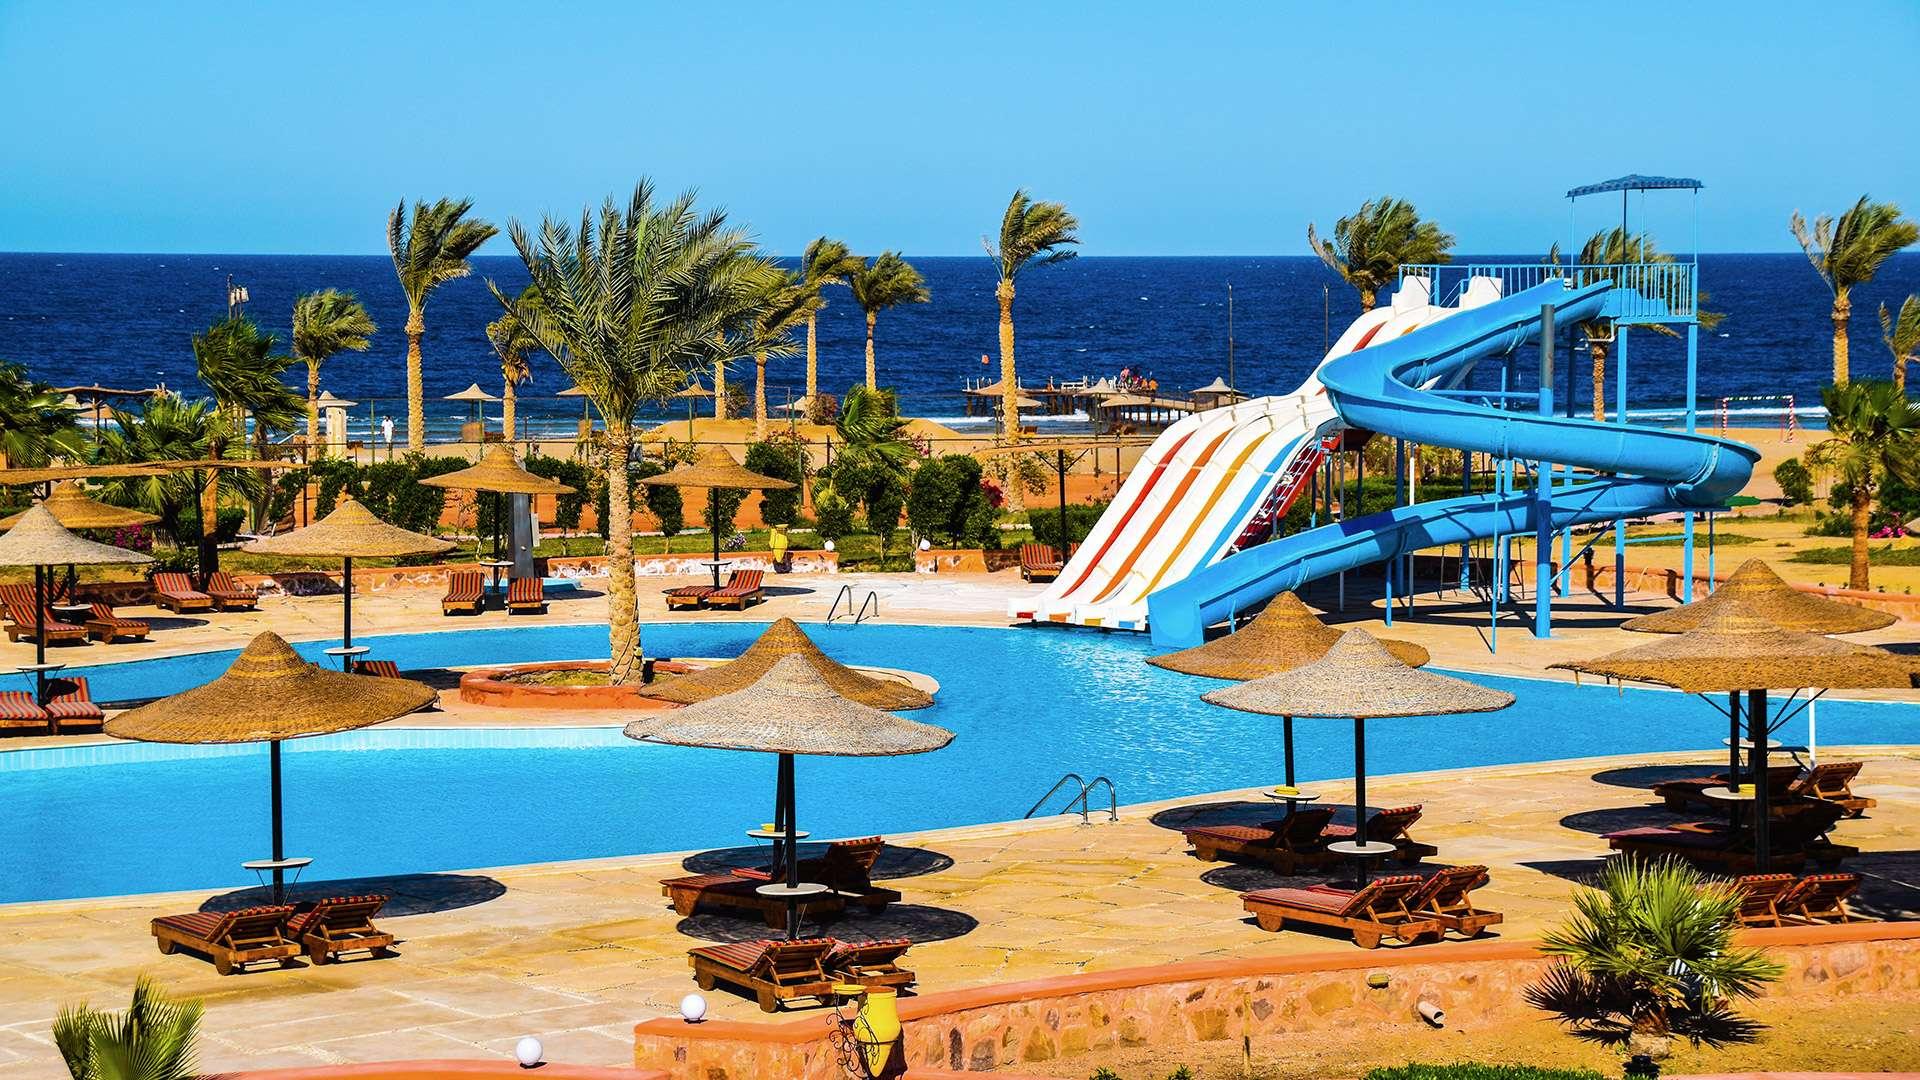 Hotel Hotelux Jolie Beach Resort Marsa Alam Ex Nada Resort Egipt Marsa Alam Opis Oferty Fly Pl